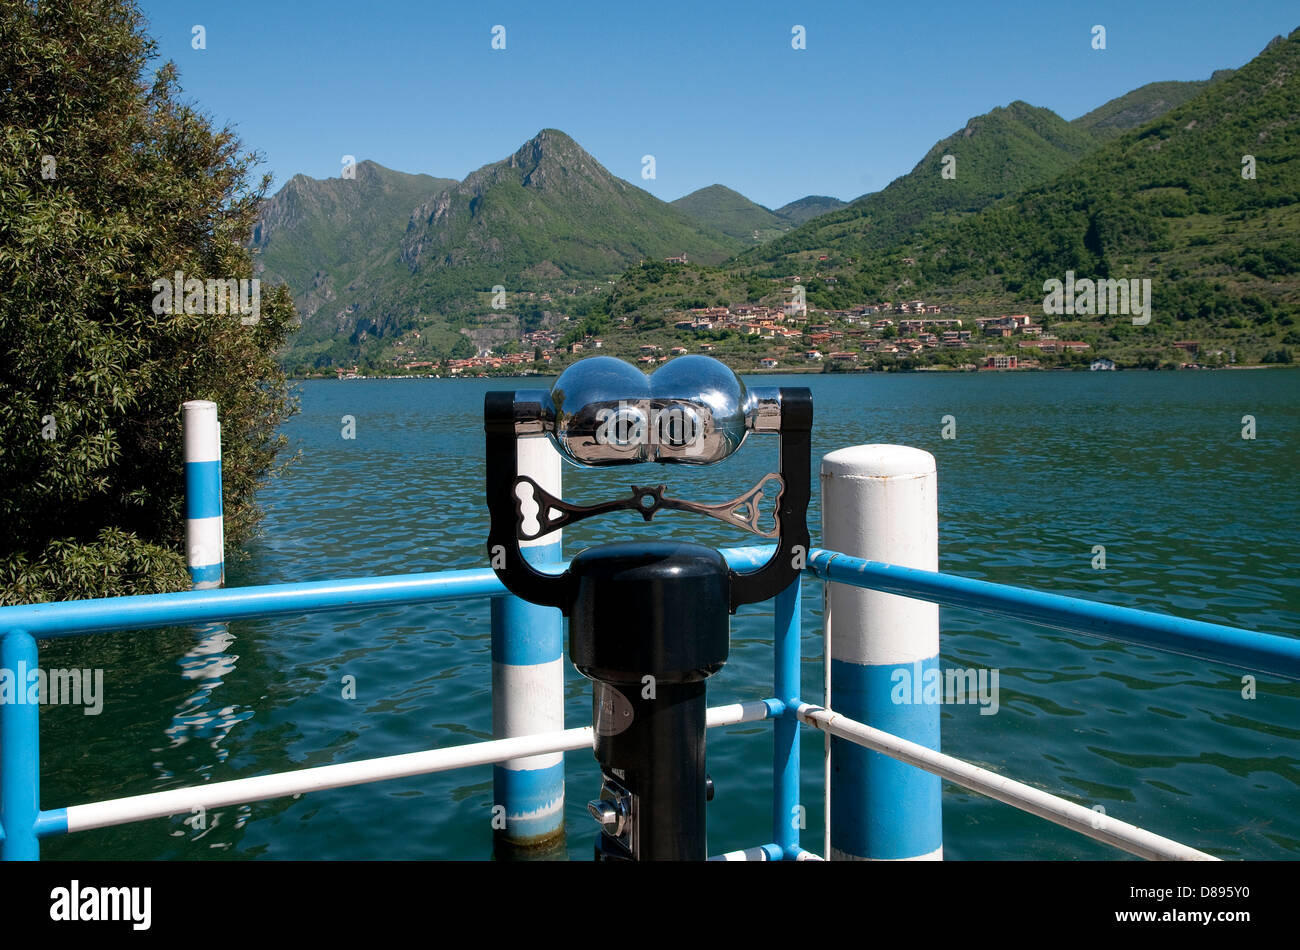 carzano, monte isola, lake iseo, lombardy, italy - Stock Image